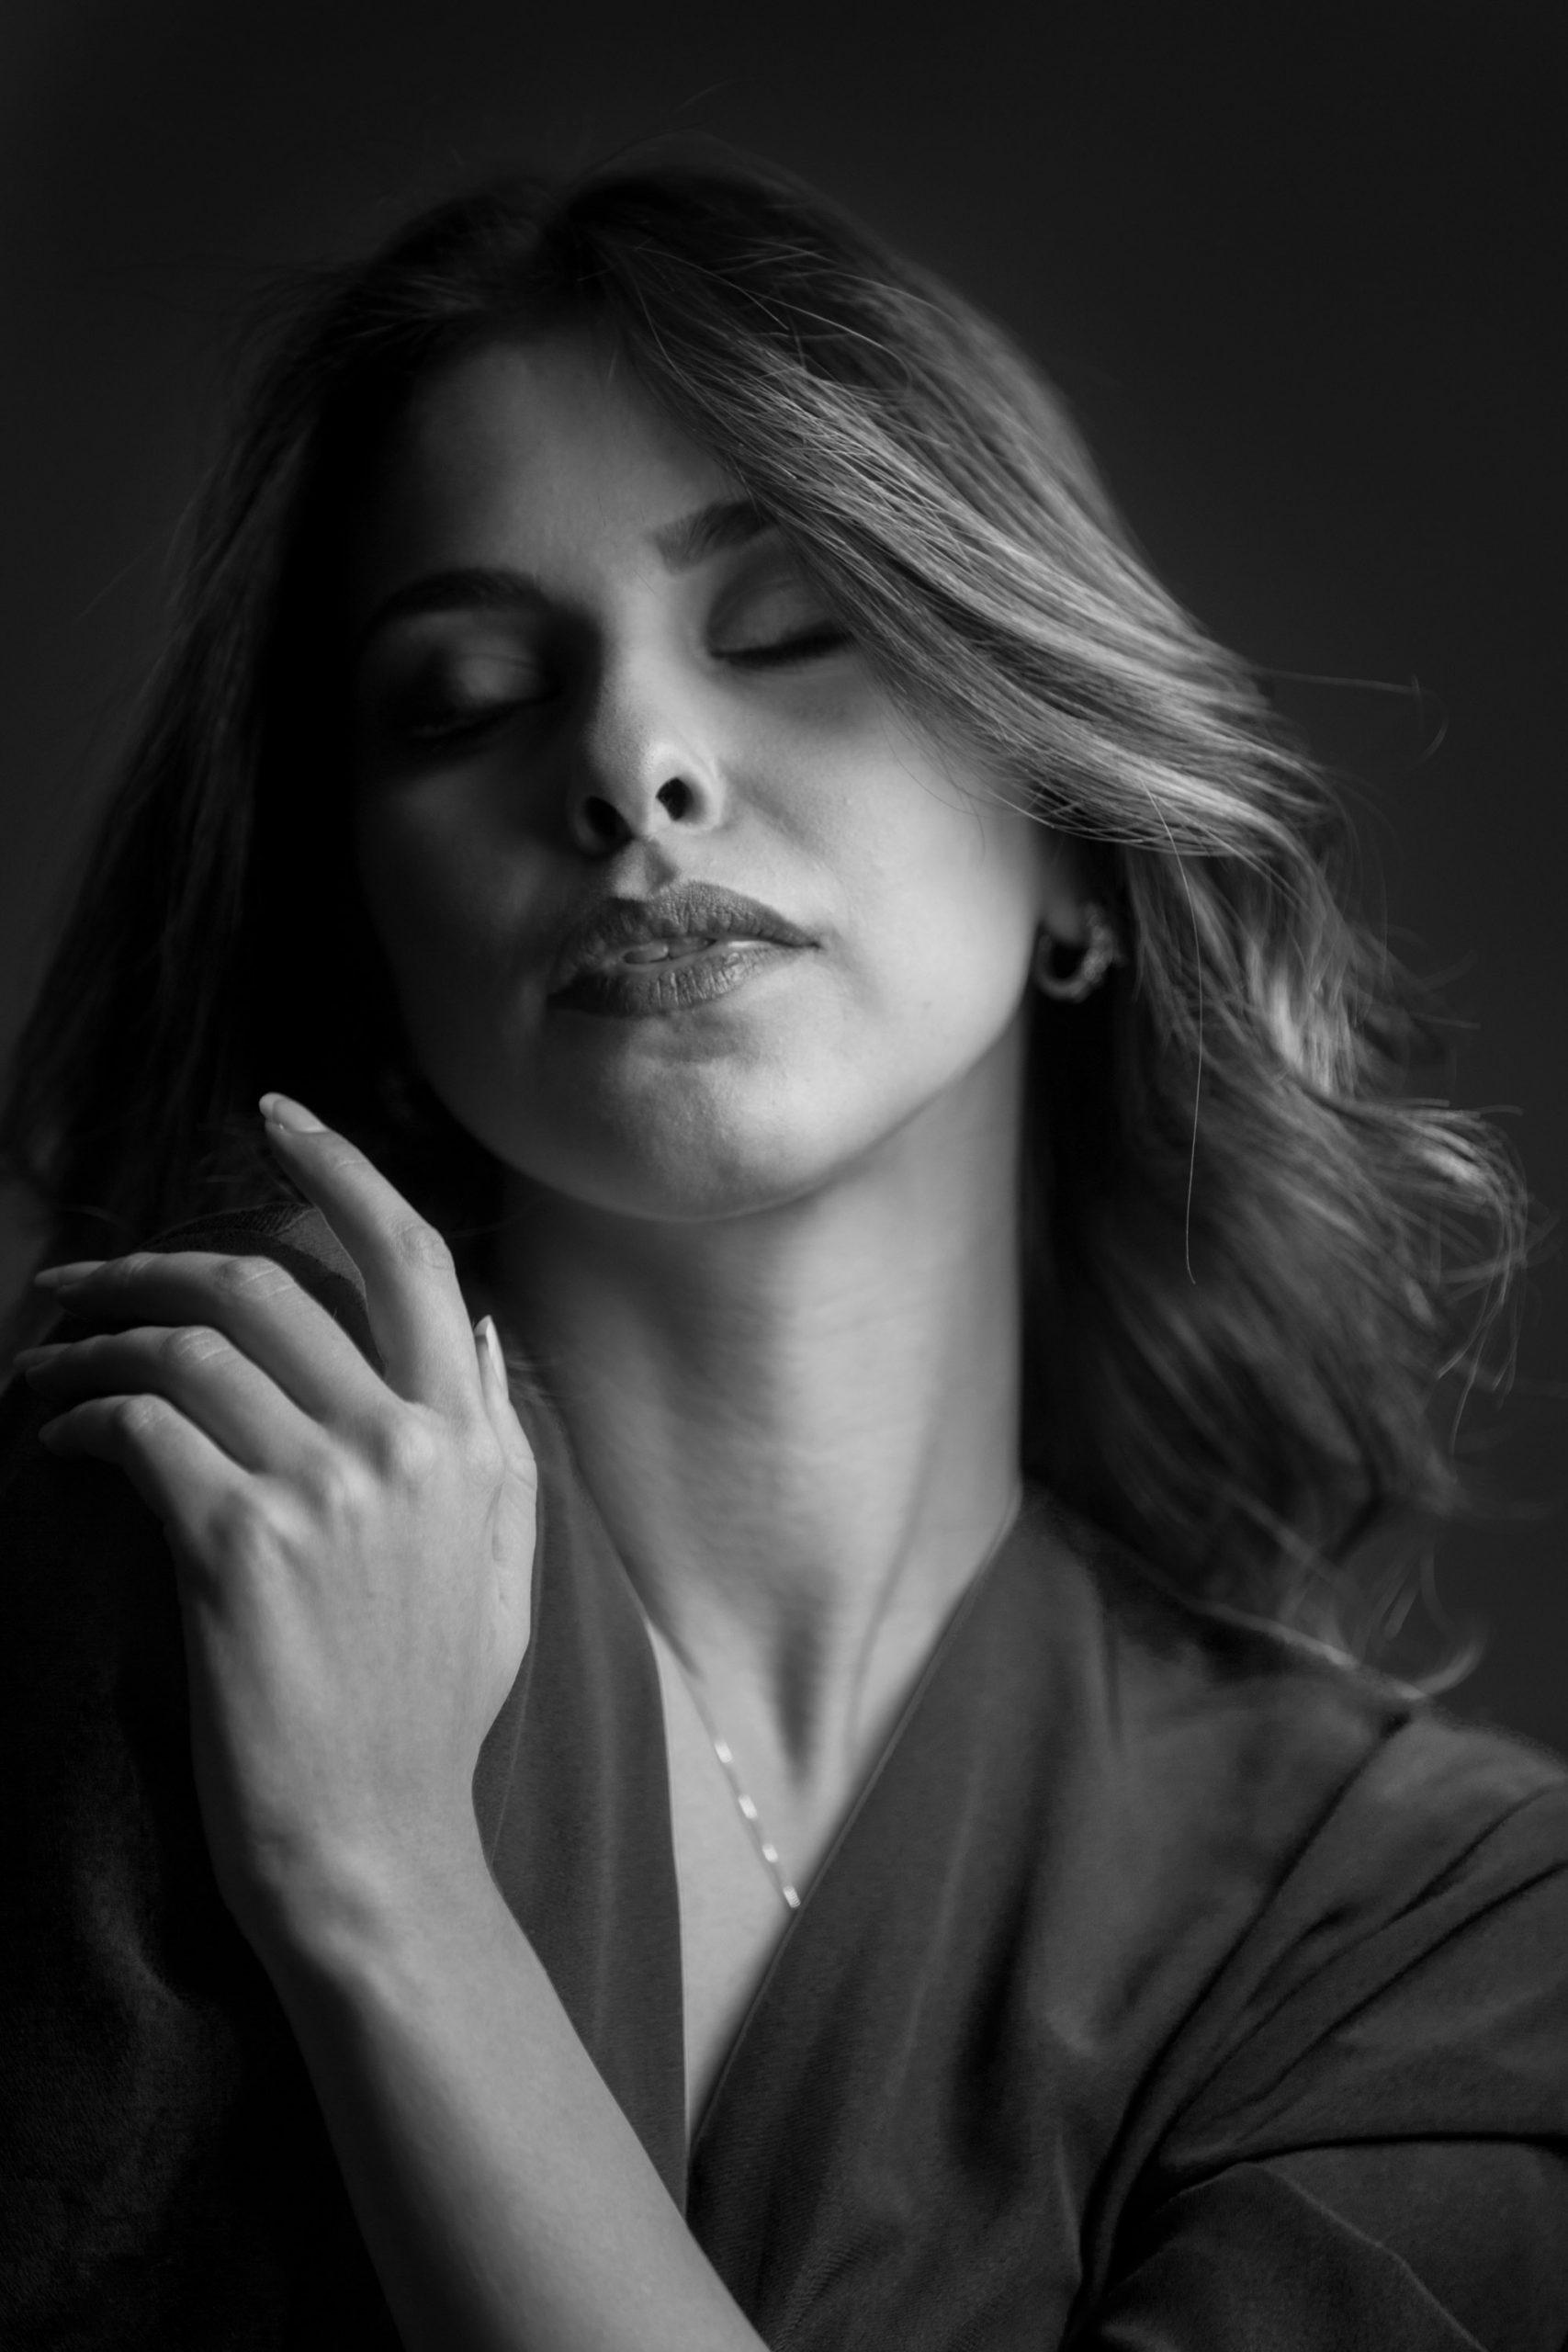 Categorie: Glamour, Portrait - Photographer: ANGELO DE MITRI - Model: MICHELA - Location: Taranto, TA, Italia